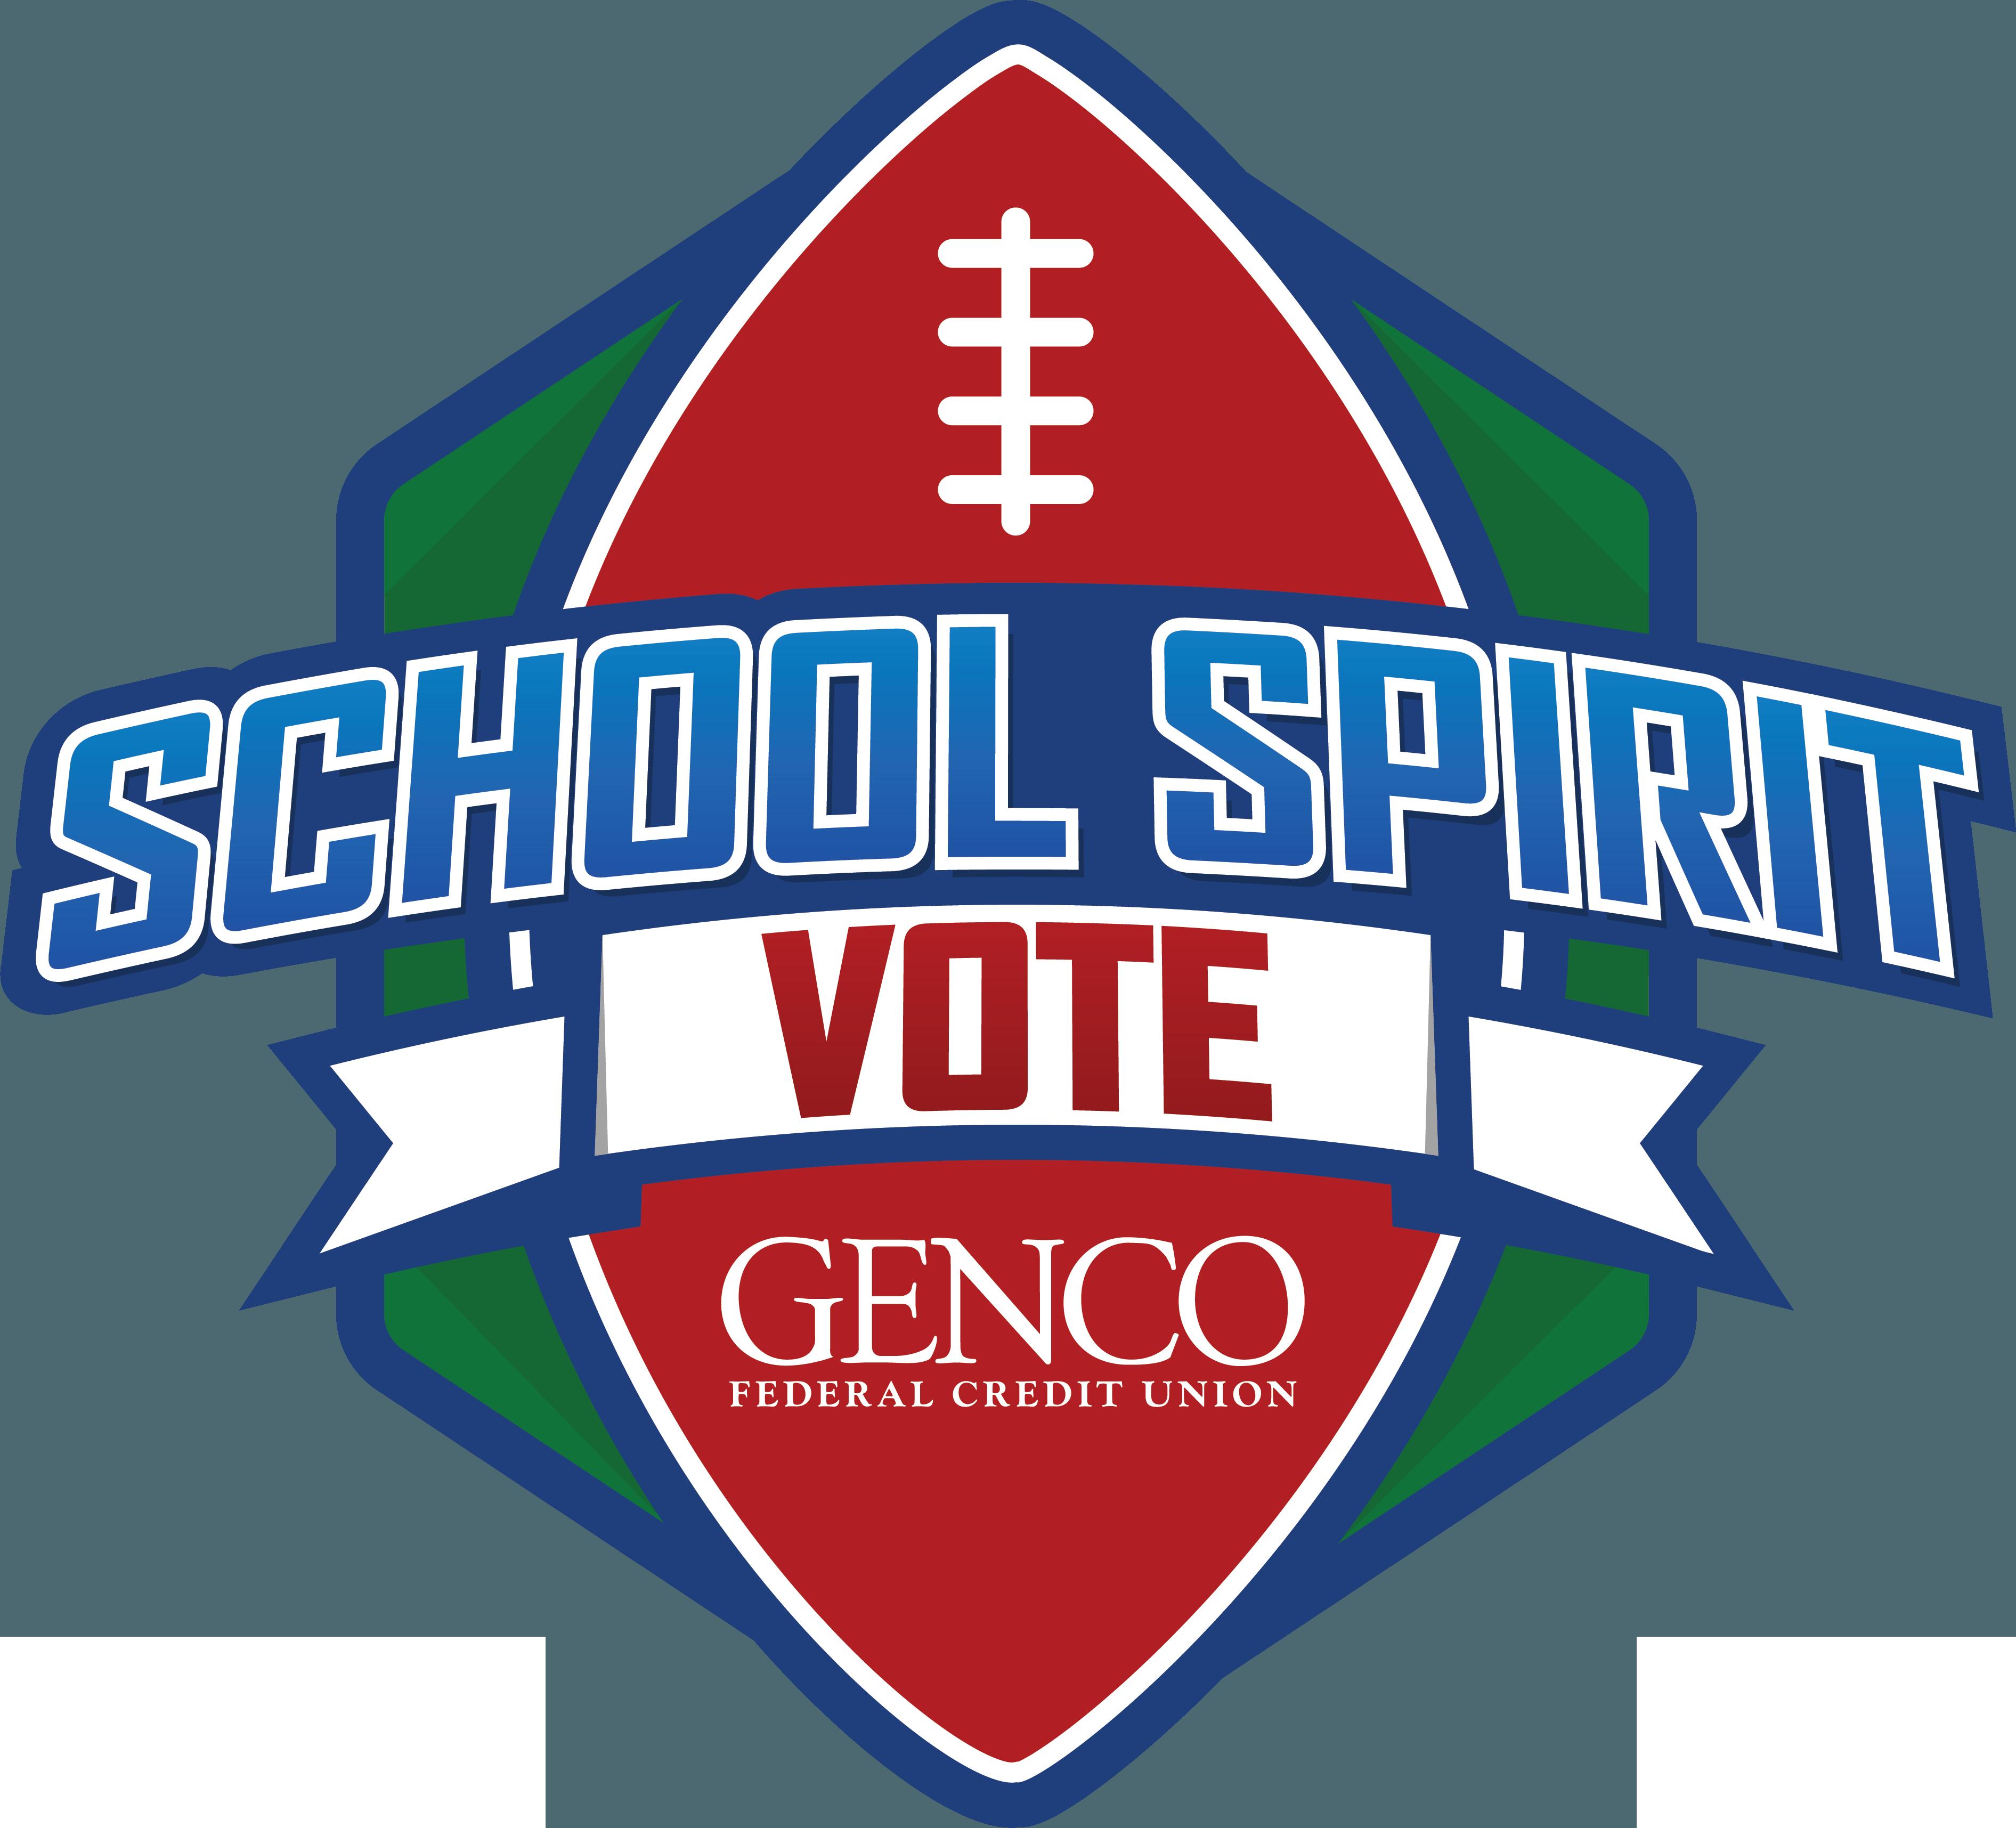 GENCO School Spirit Vote